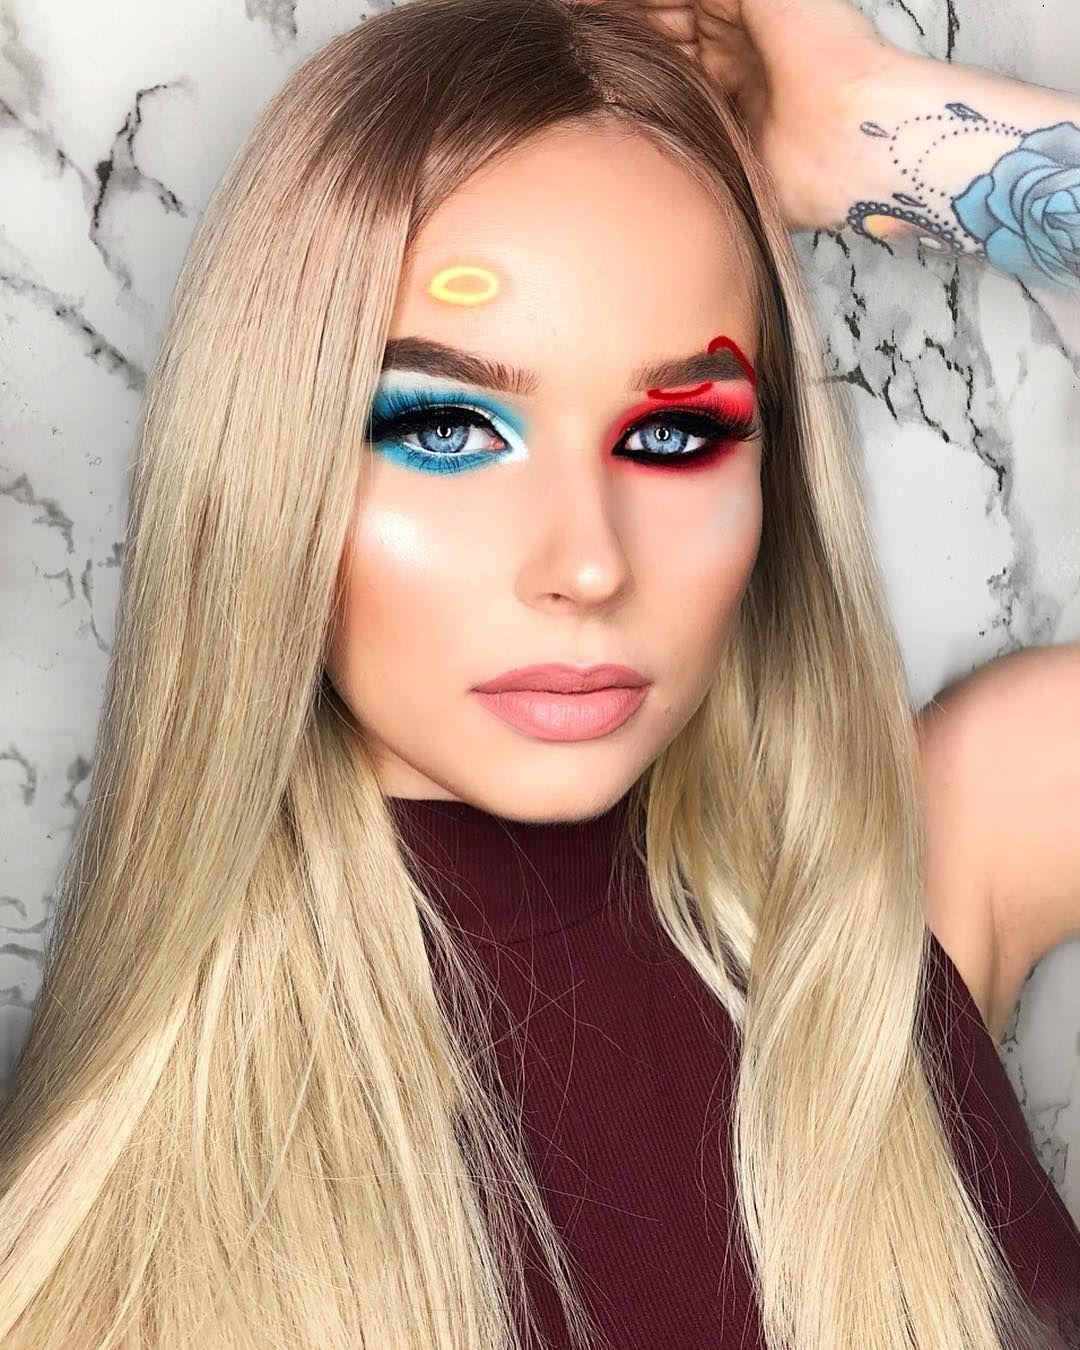 Pinterest selfcareoverload Halloween makeup inspiration